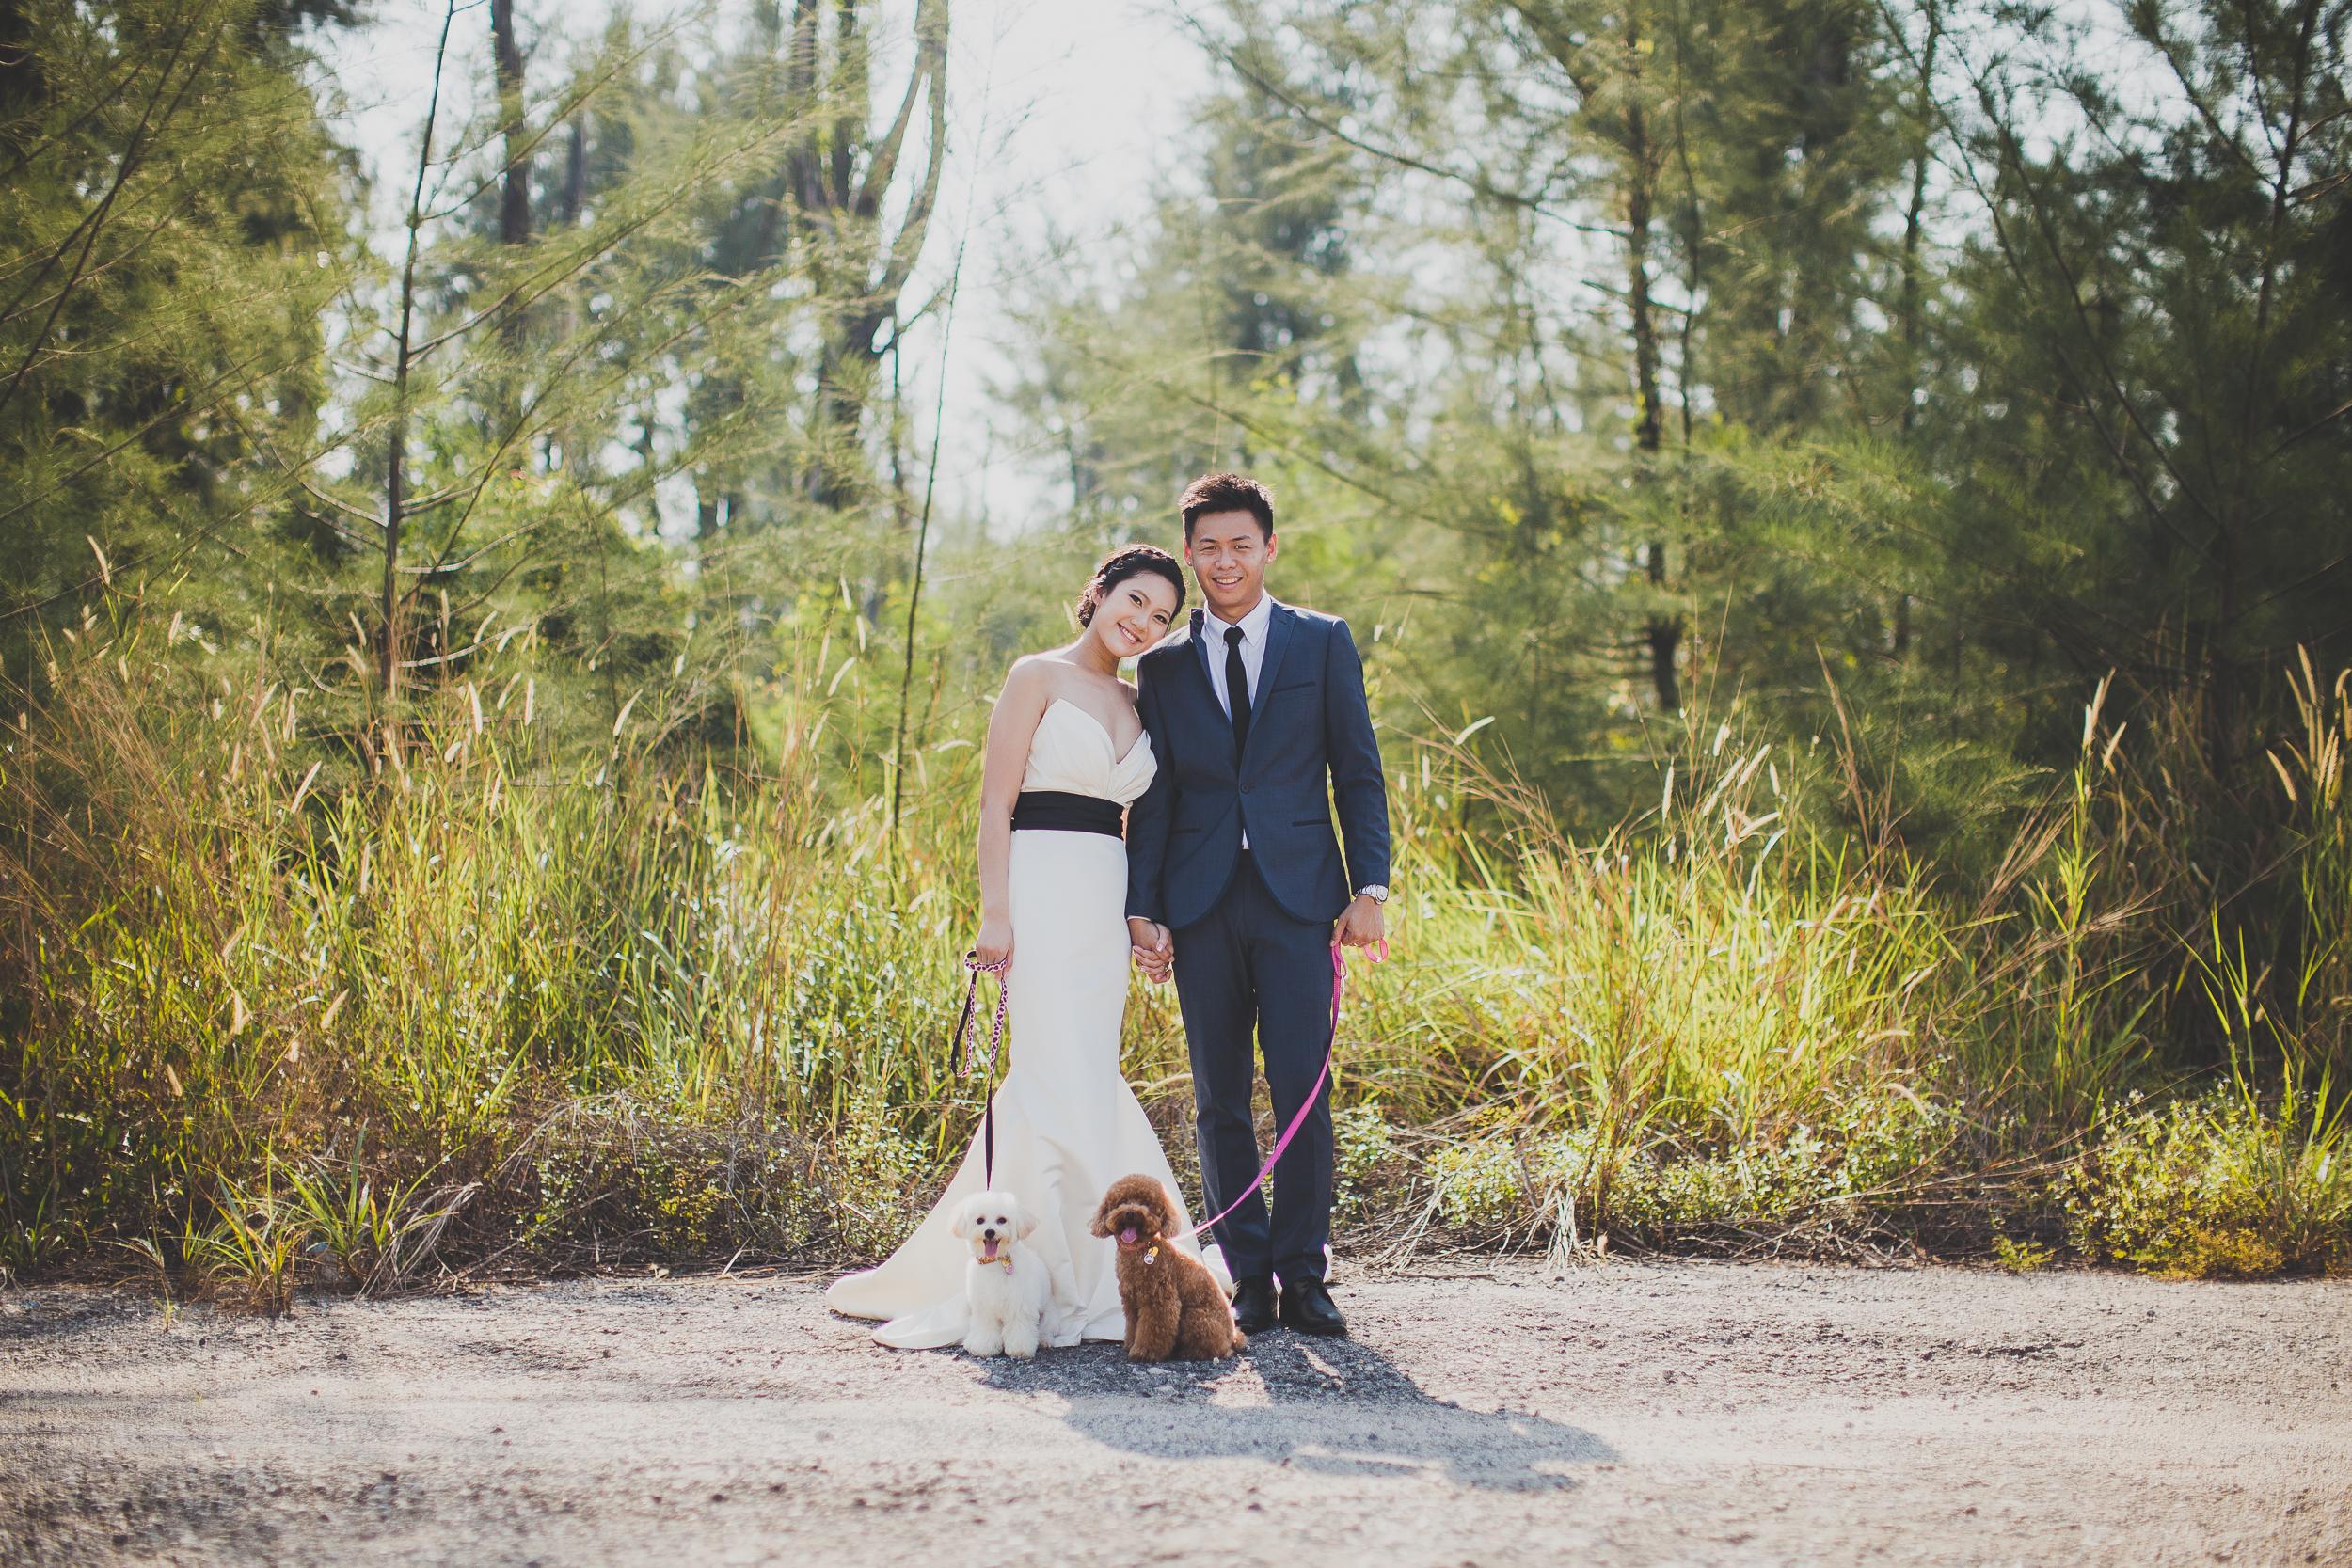 Singapore+Pre+Wedding+Photographer+Ziyang+Clara-0035.jpg